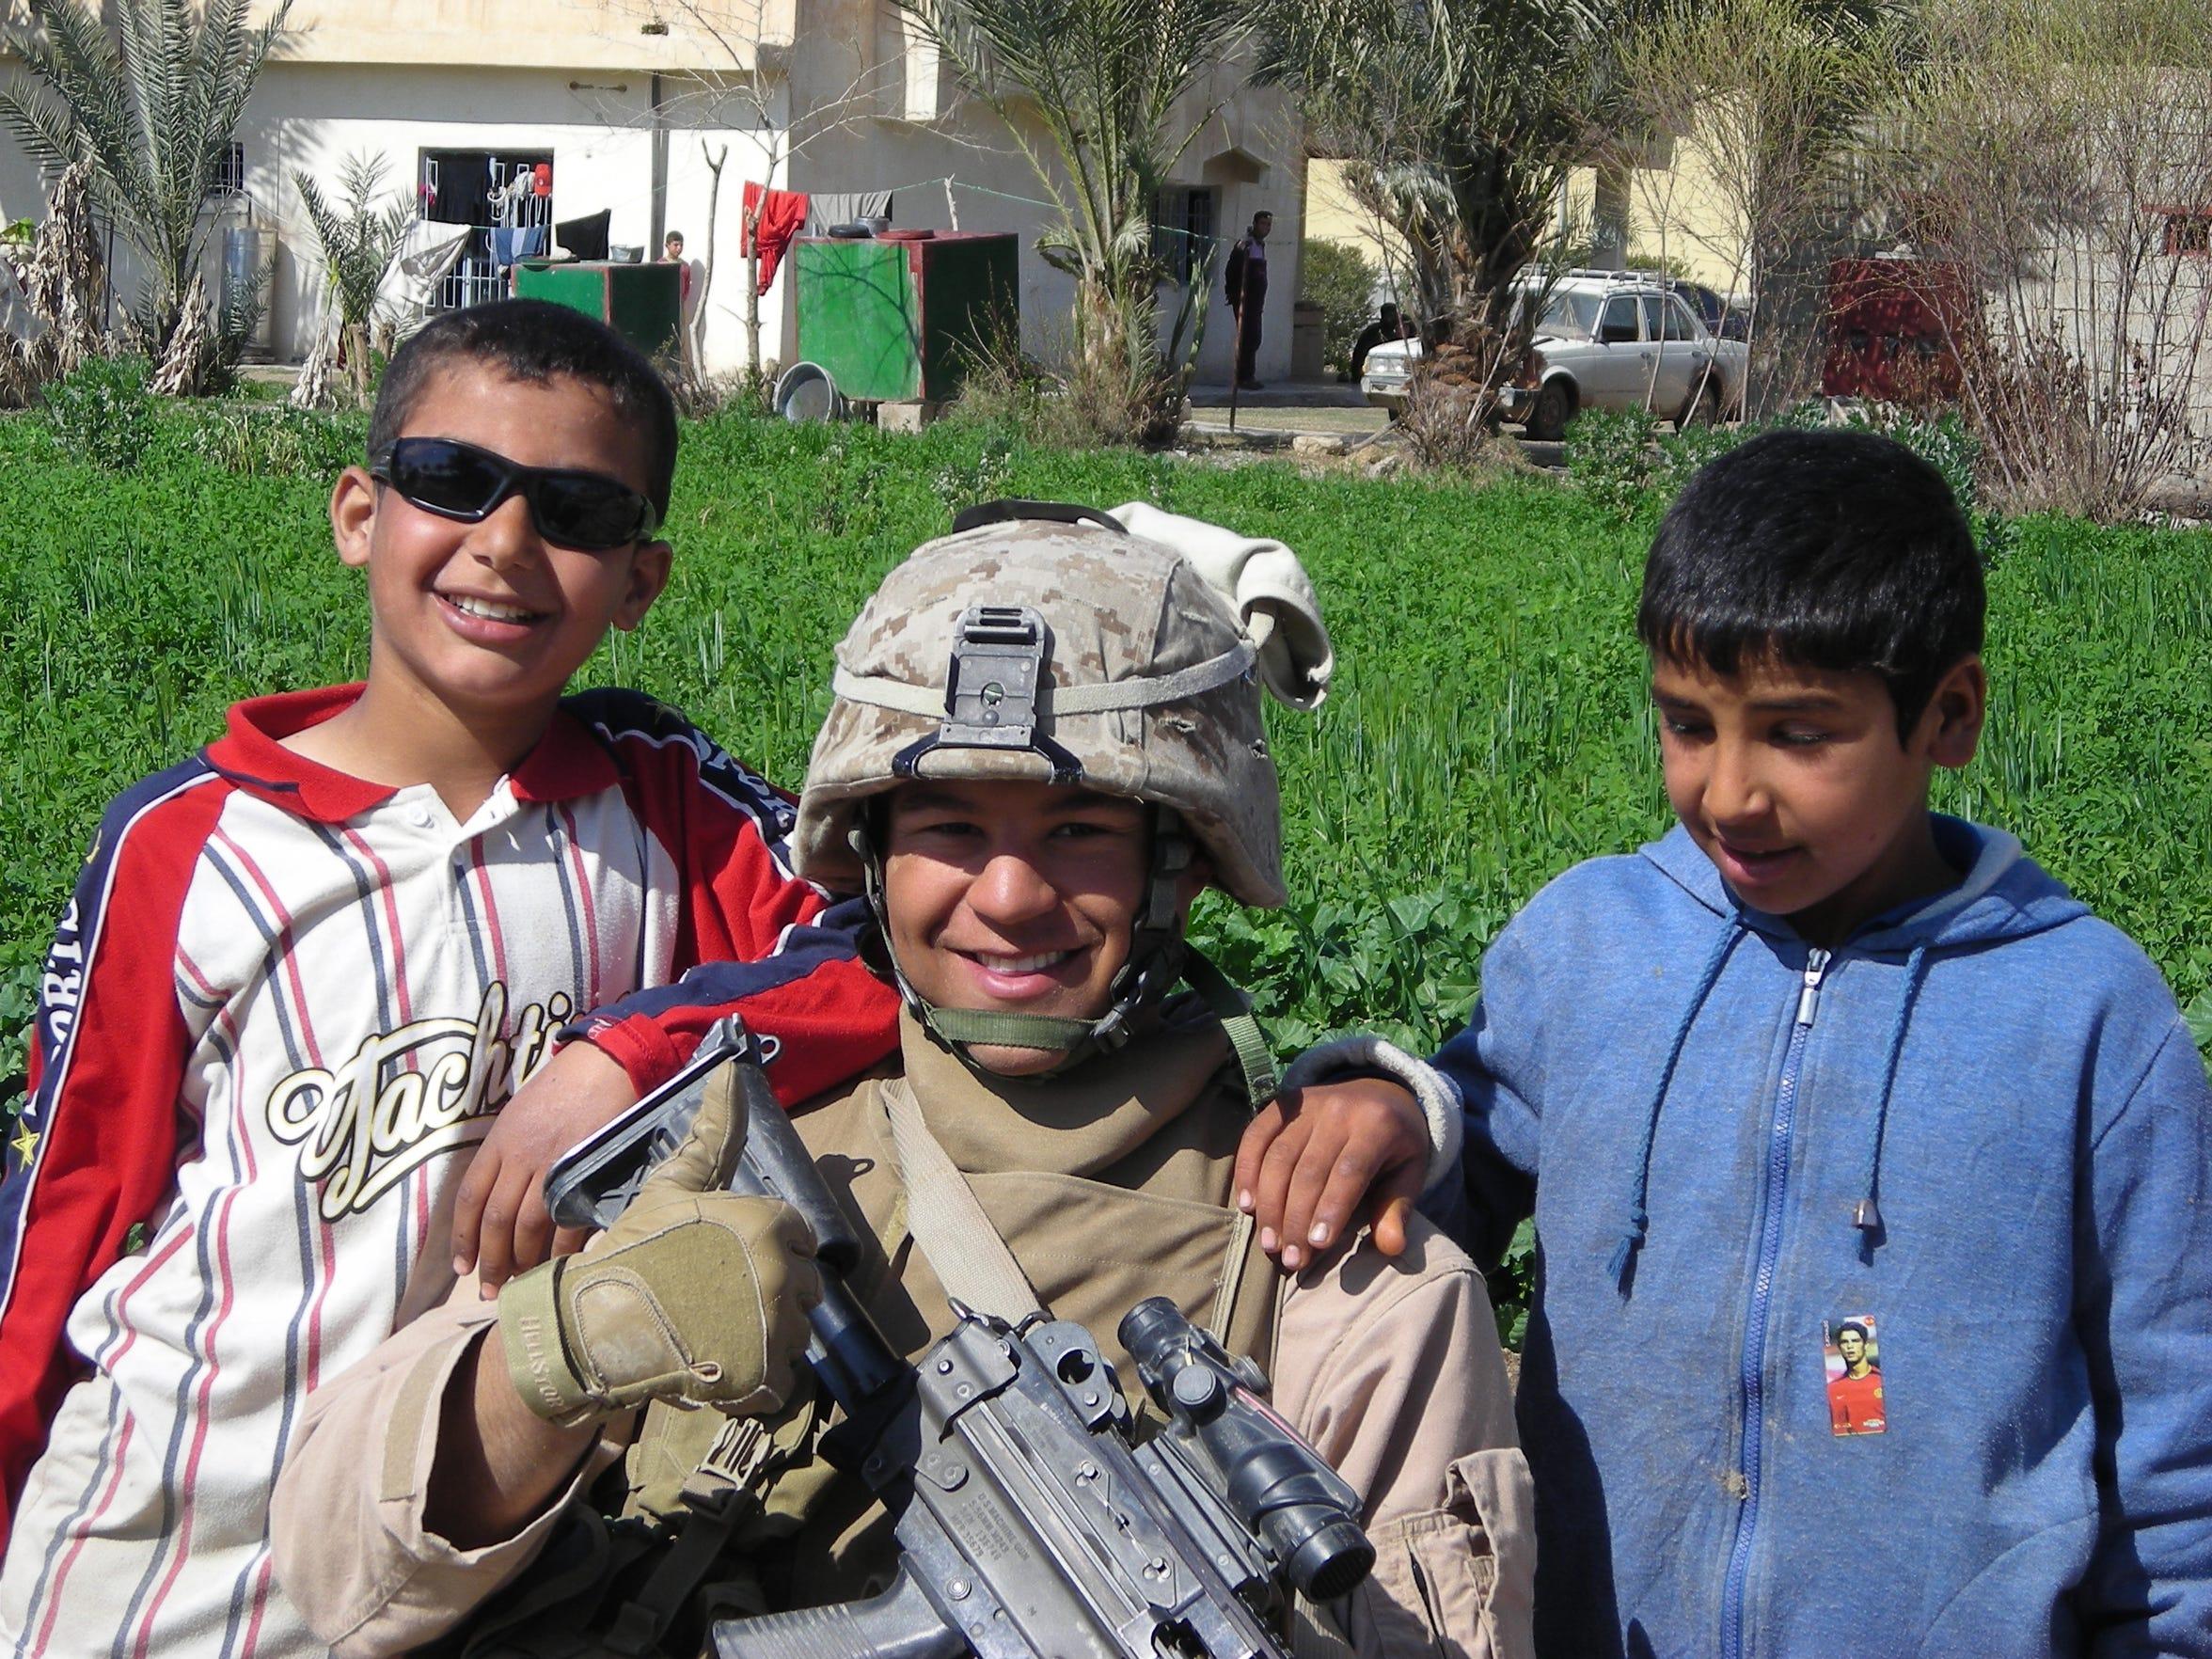 LIVE Cpl. Richard McShan in Iraq